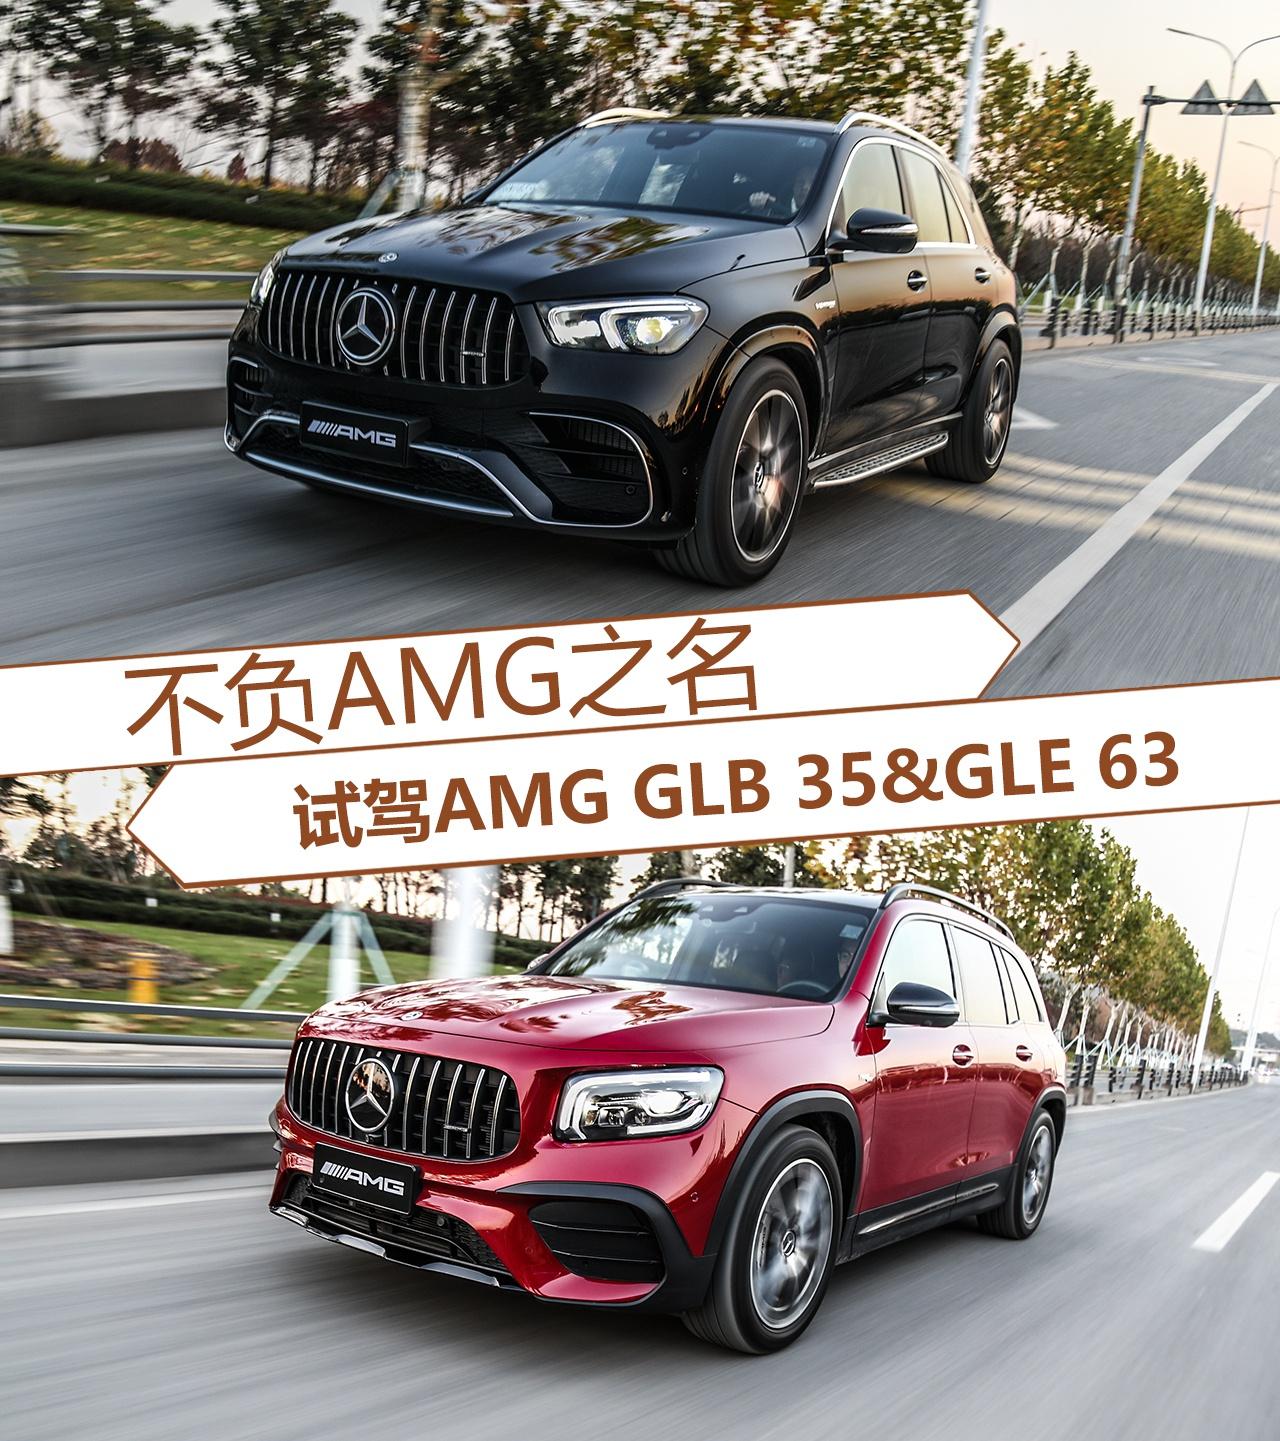 不负AMG之名 试驾AMG GLB 35&GLE 63